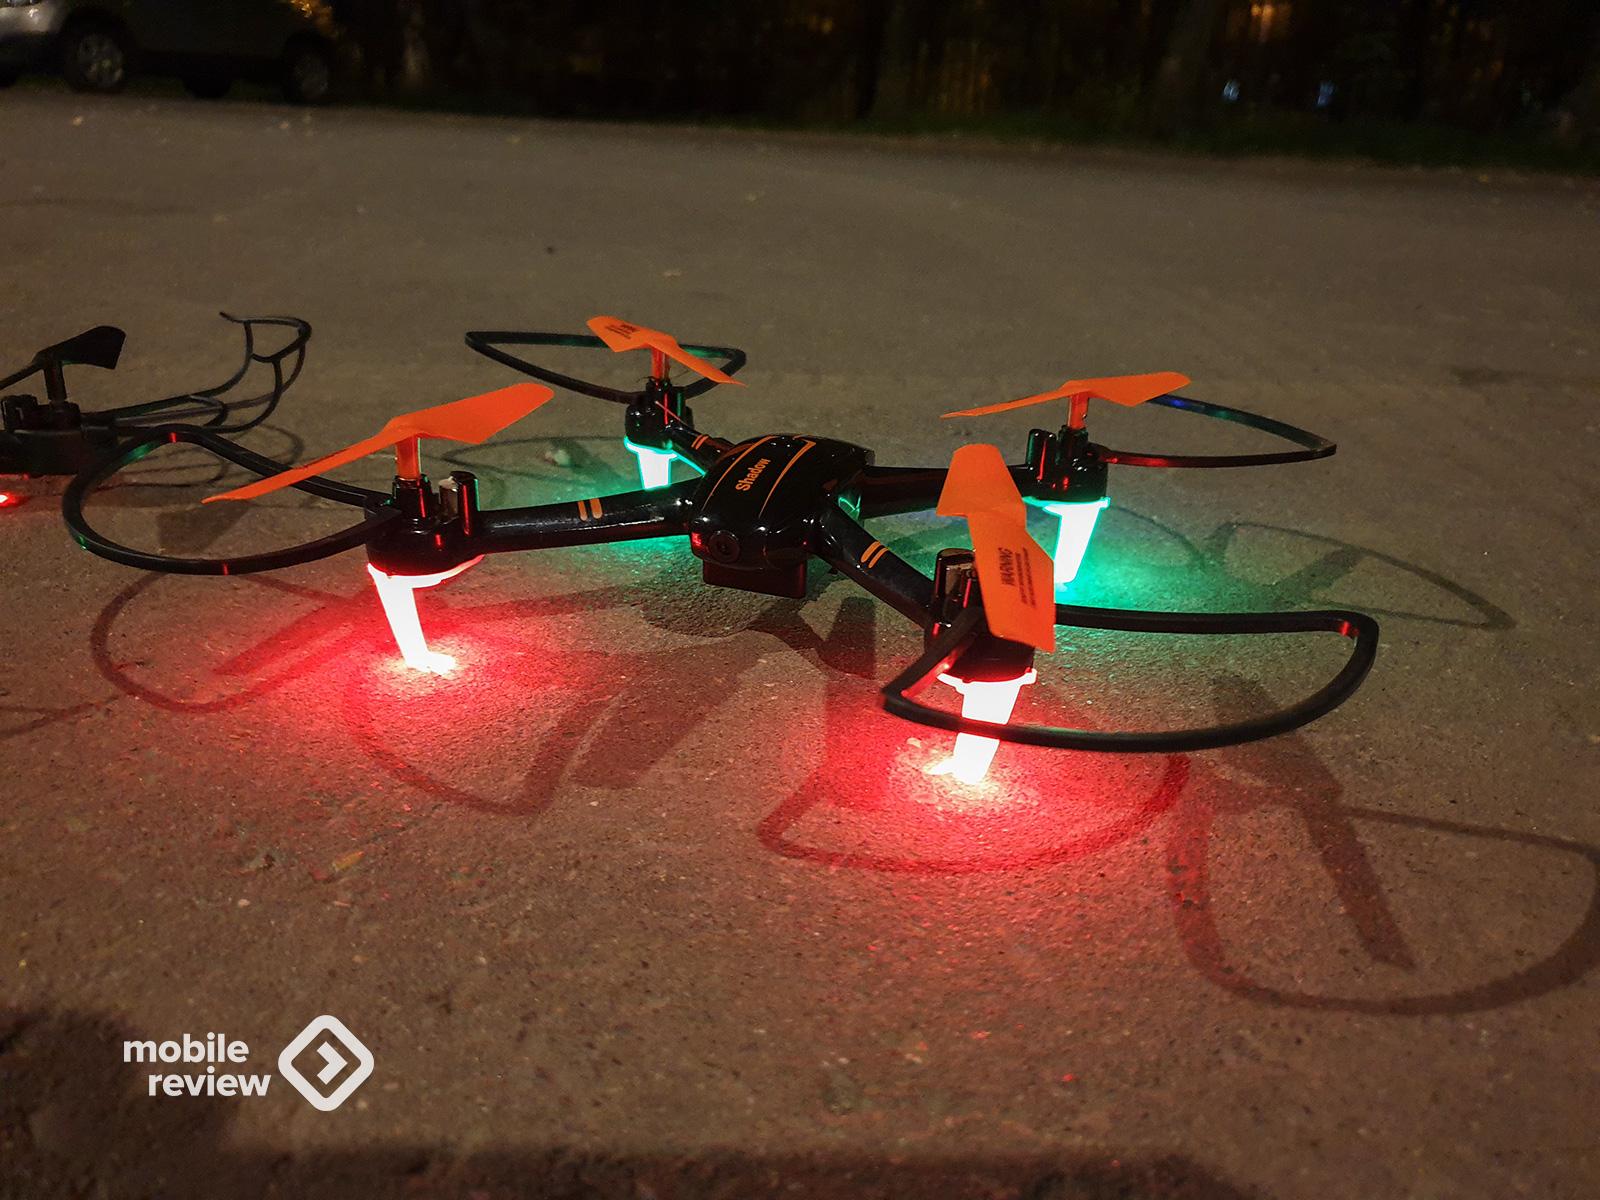 Квадрокоптер на лето: два дрона Hiper за 3 и 6.5тысяч рублей